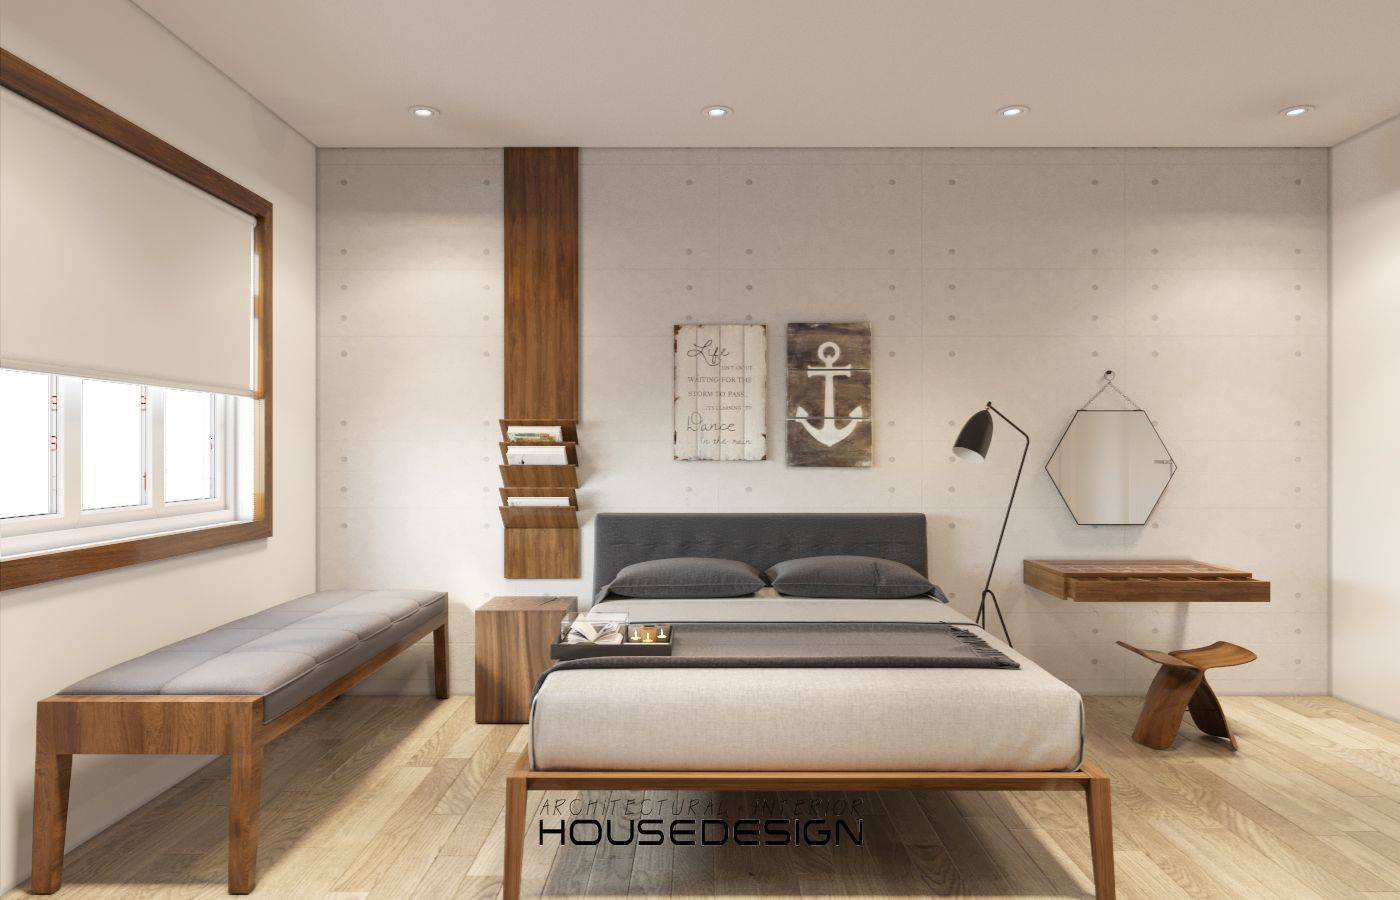 phong ngu cao cap - Housedesign